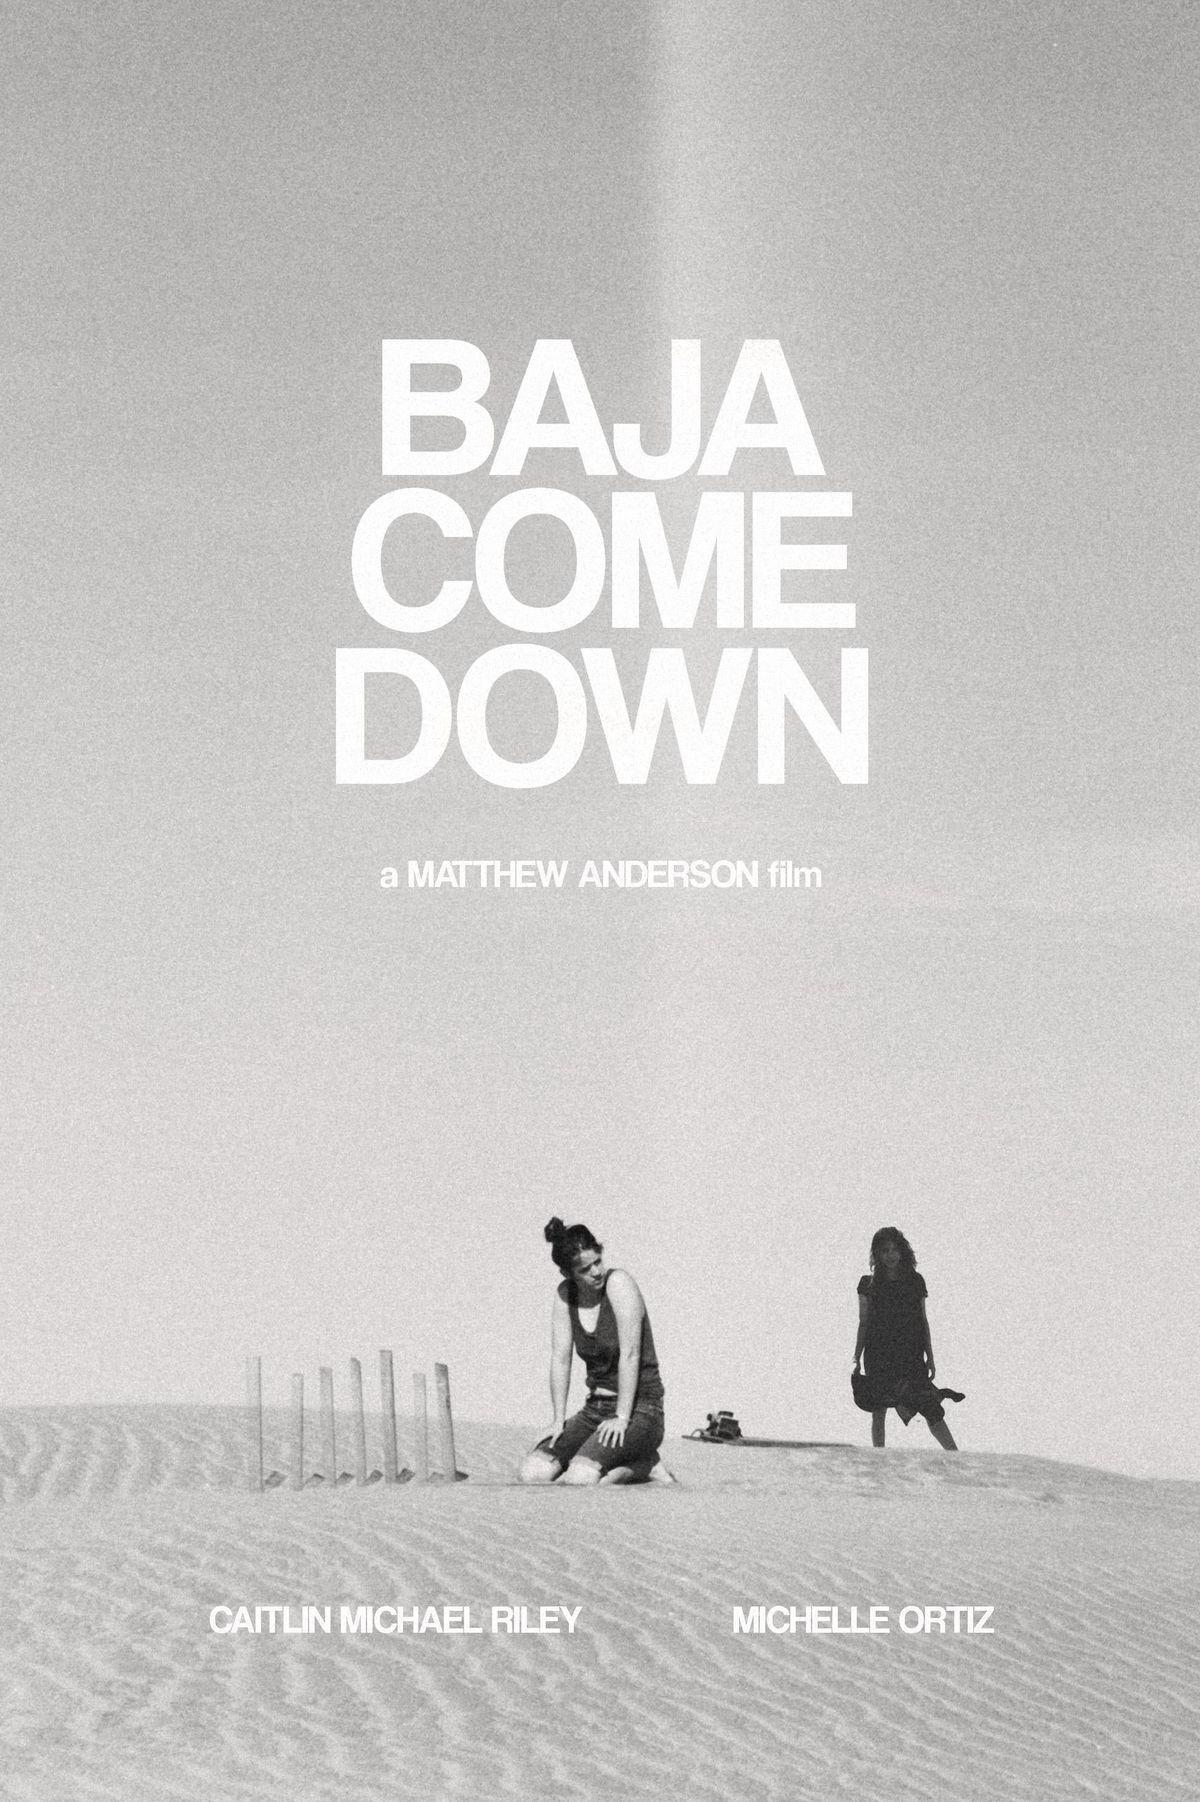 Baja Come Down